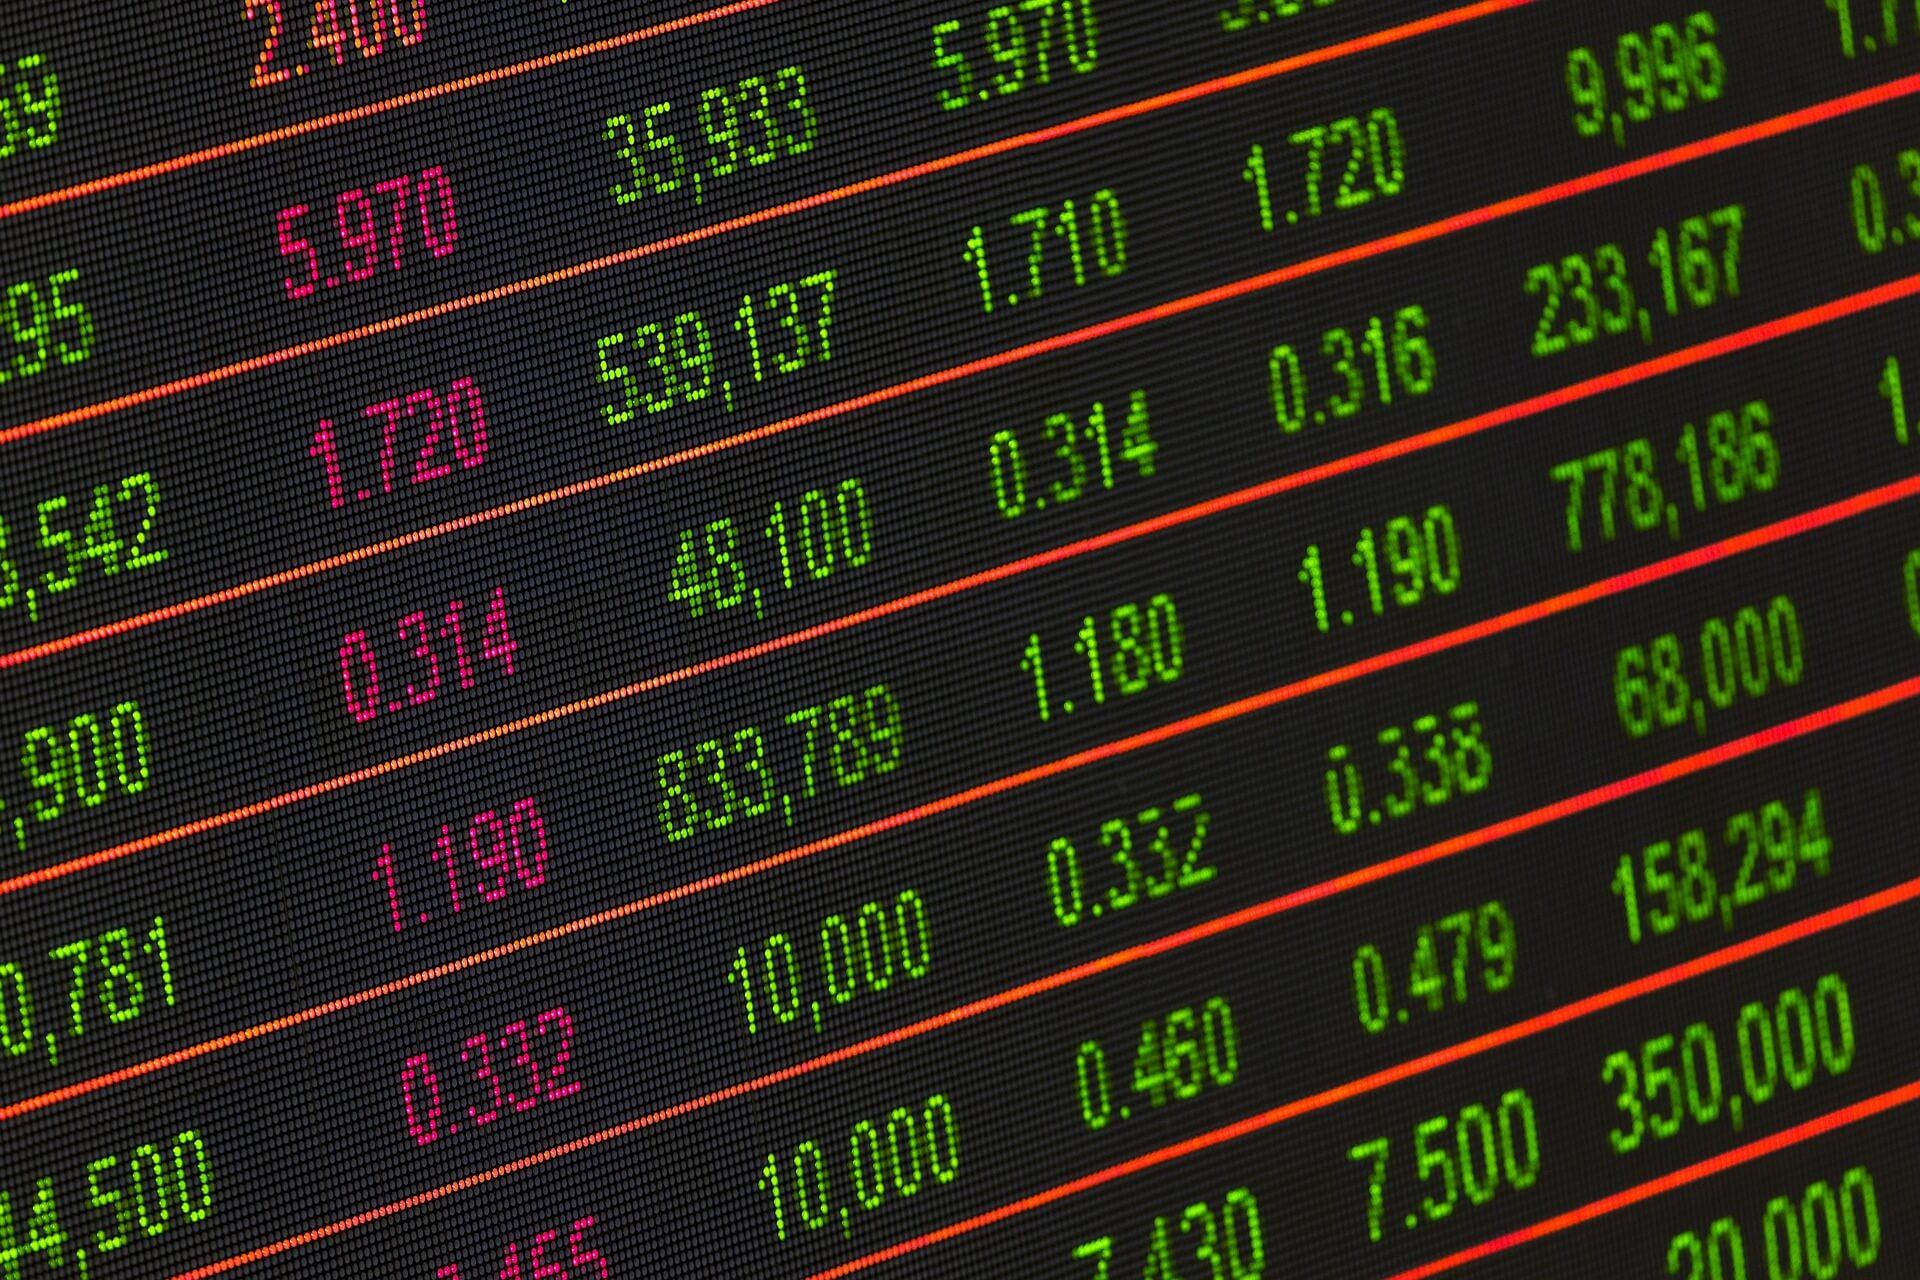 Aetna Posts Higher 2nd-Quarter Profit On Strong Health Segment